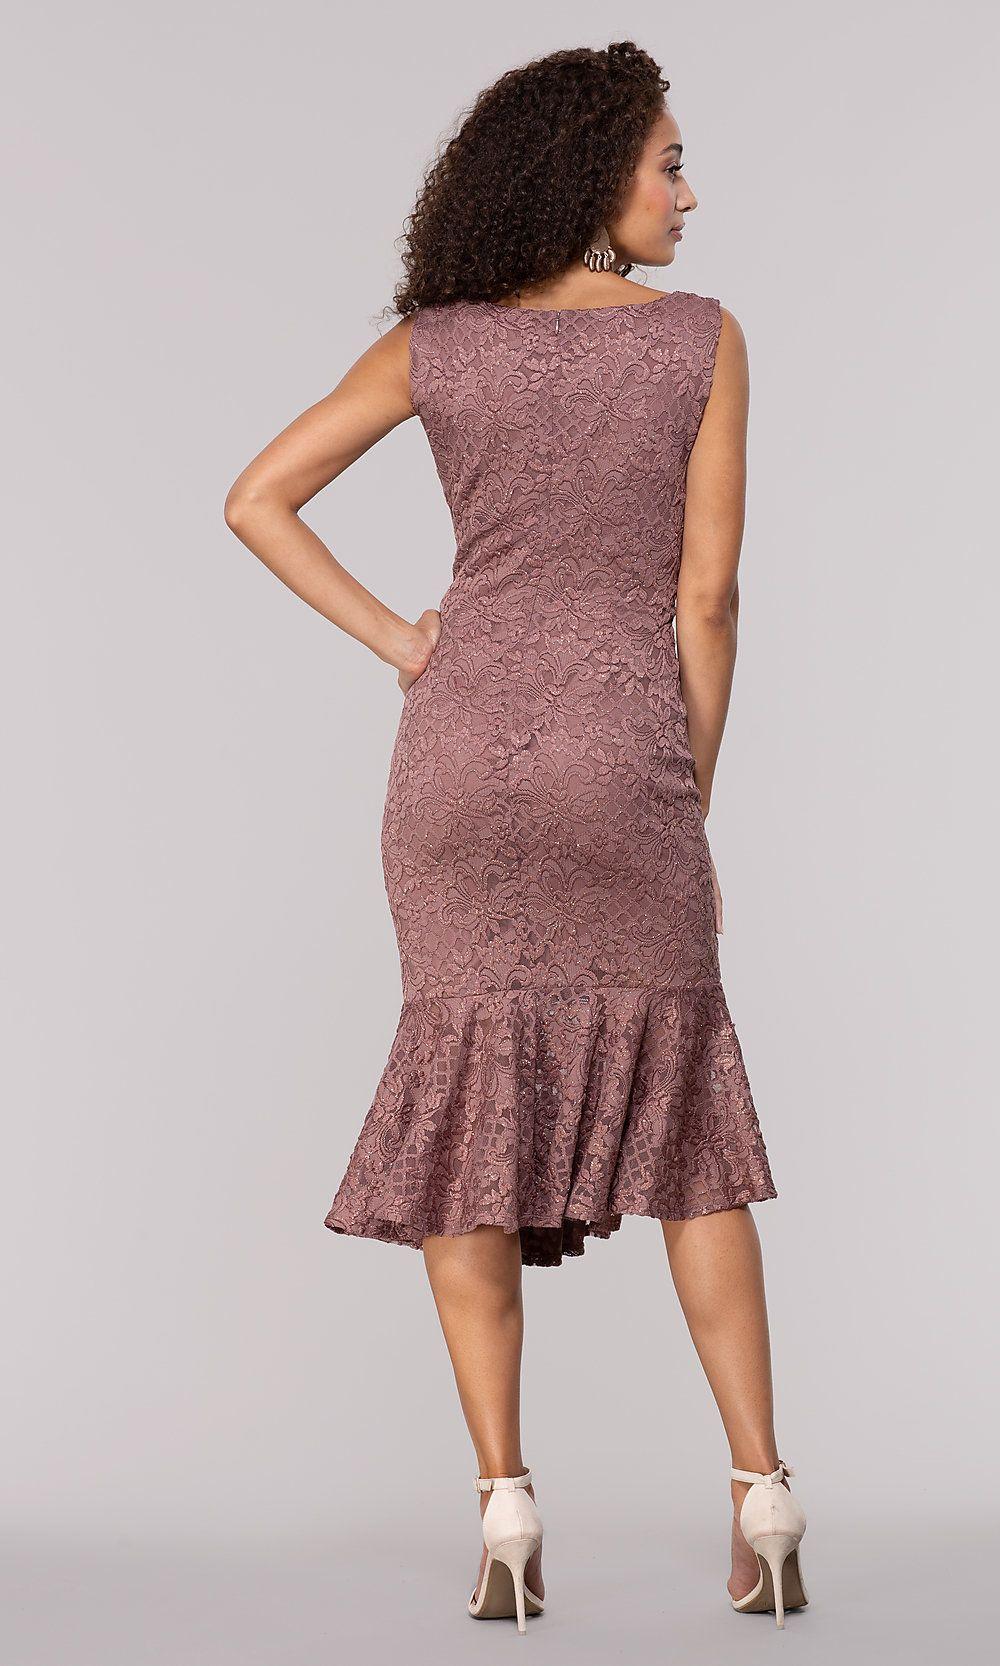 Knee Length Glitter Lace Wedding Guest Dress Dresses Wedding Guest Dress Beautiful Party Dresses [ 1666 x 1000 Pixel ]